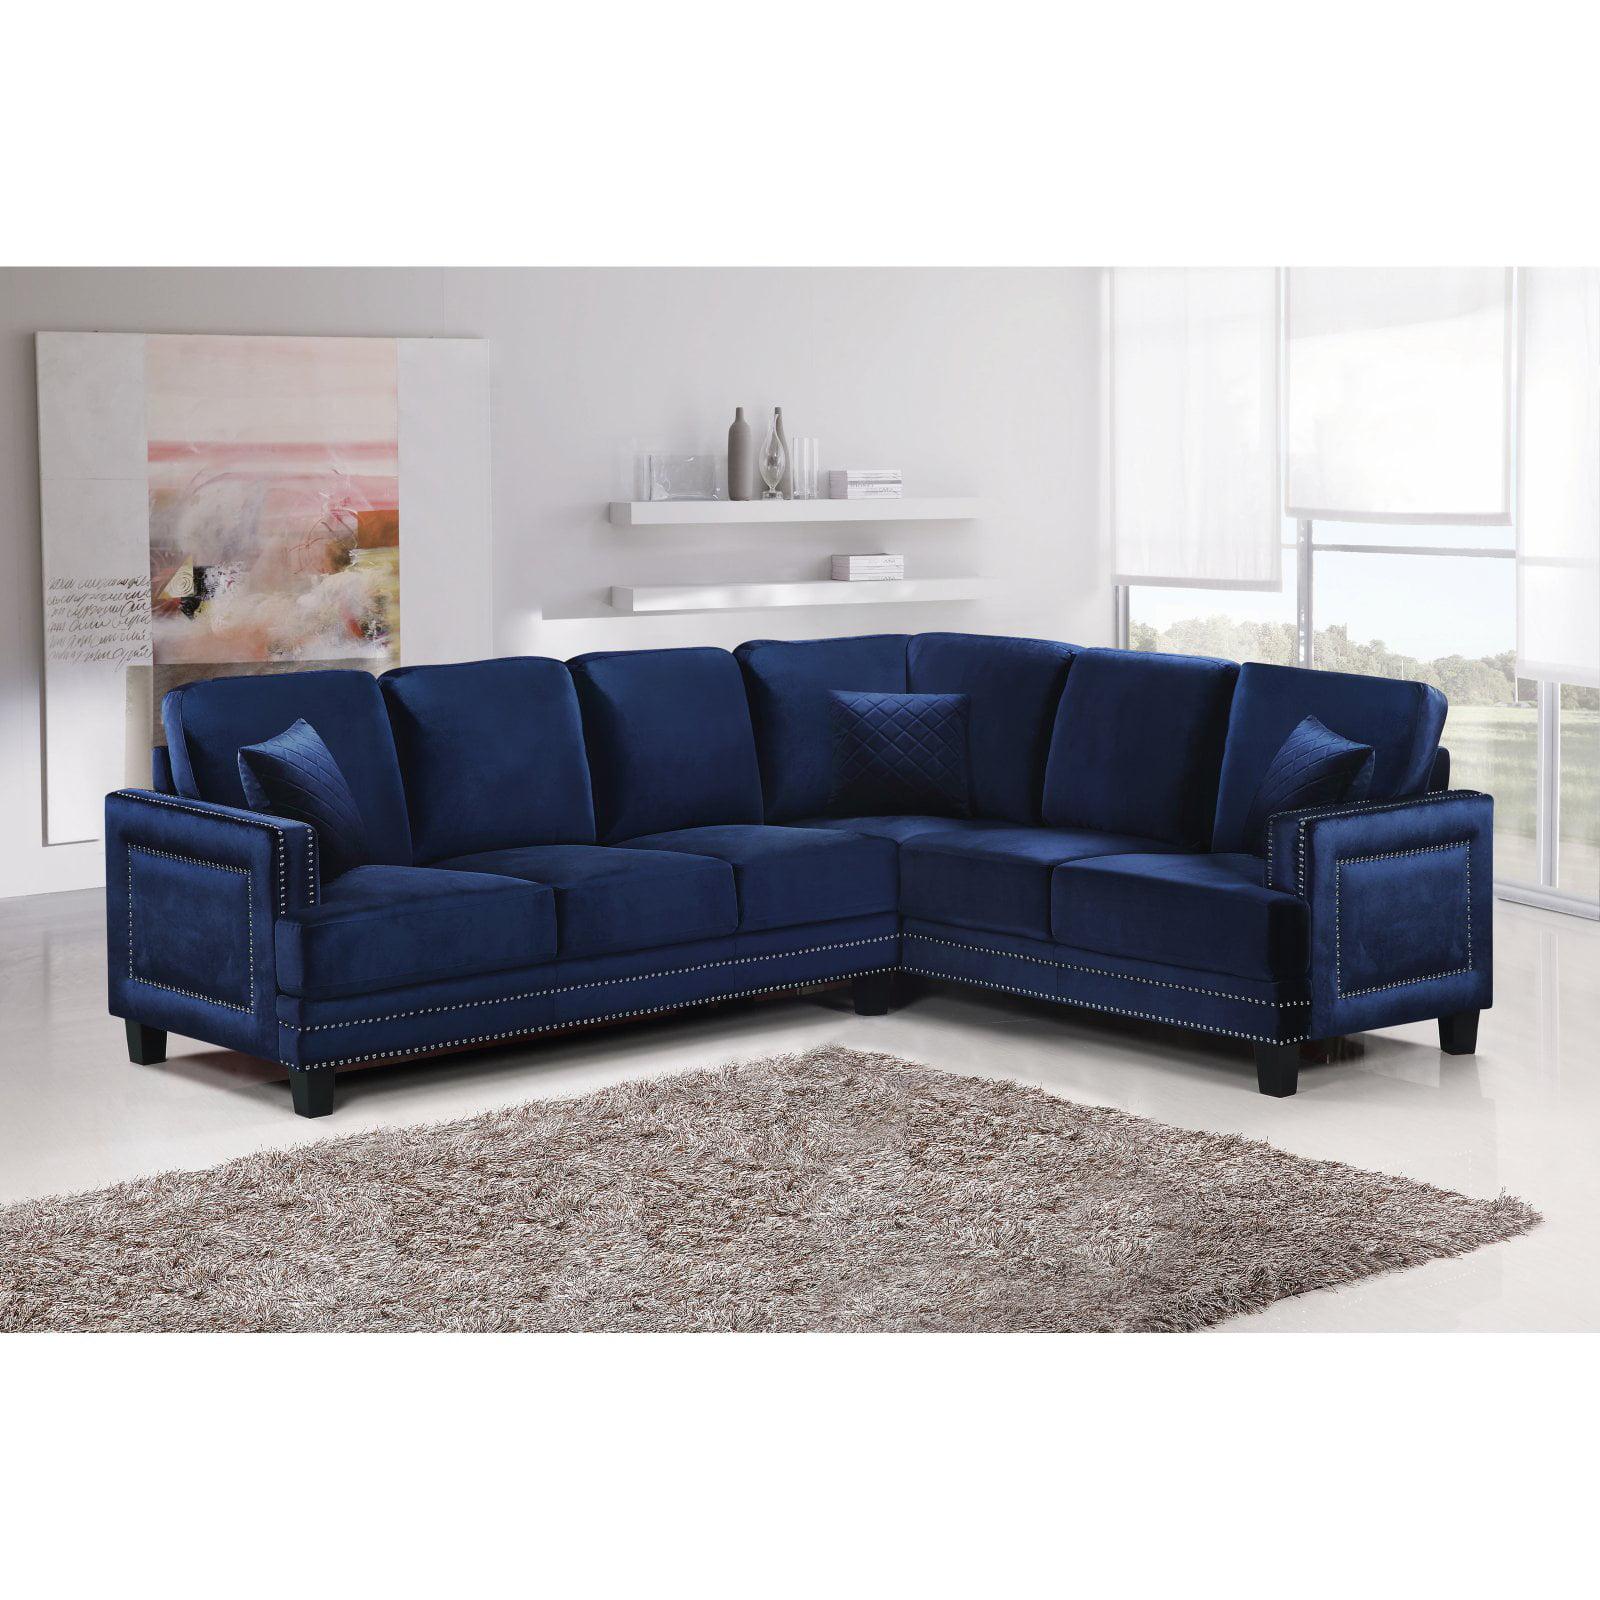 Meridian Furniture Inc Ferrara 2 Piece Sectional Sofa with Pillows